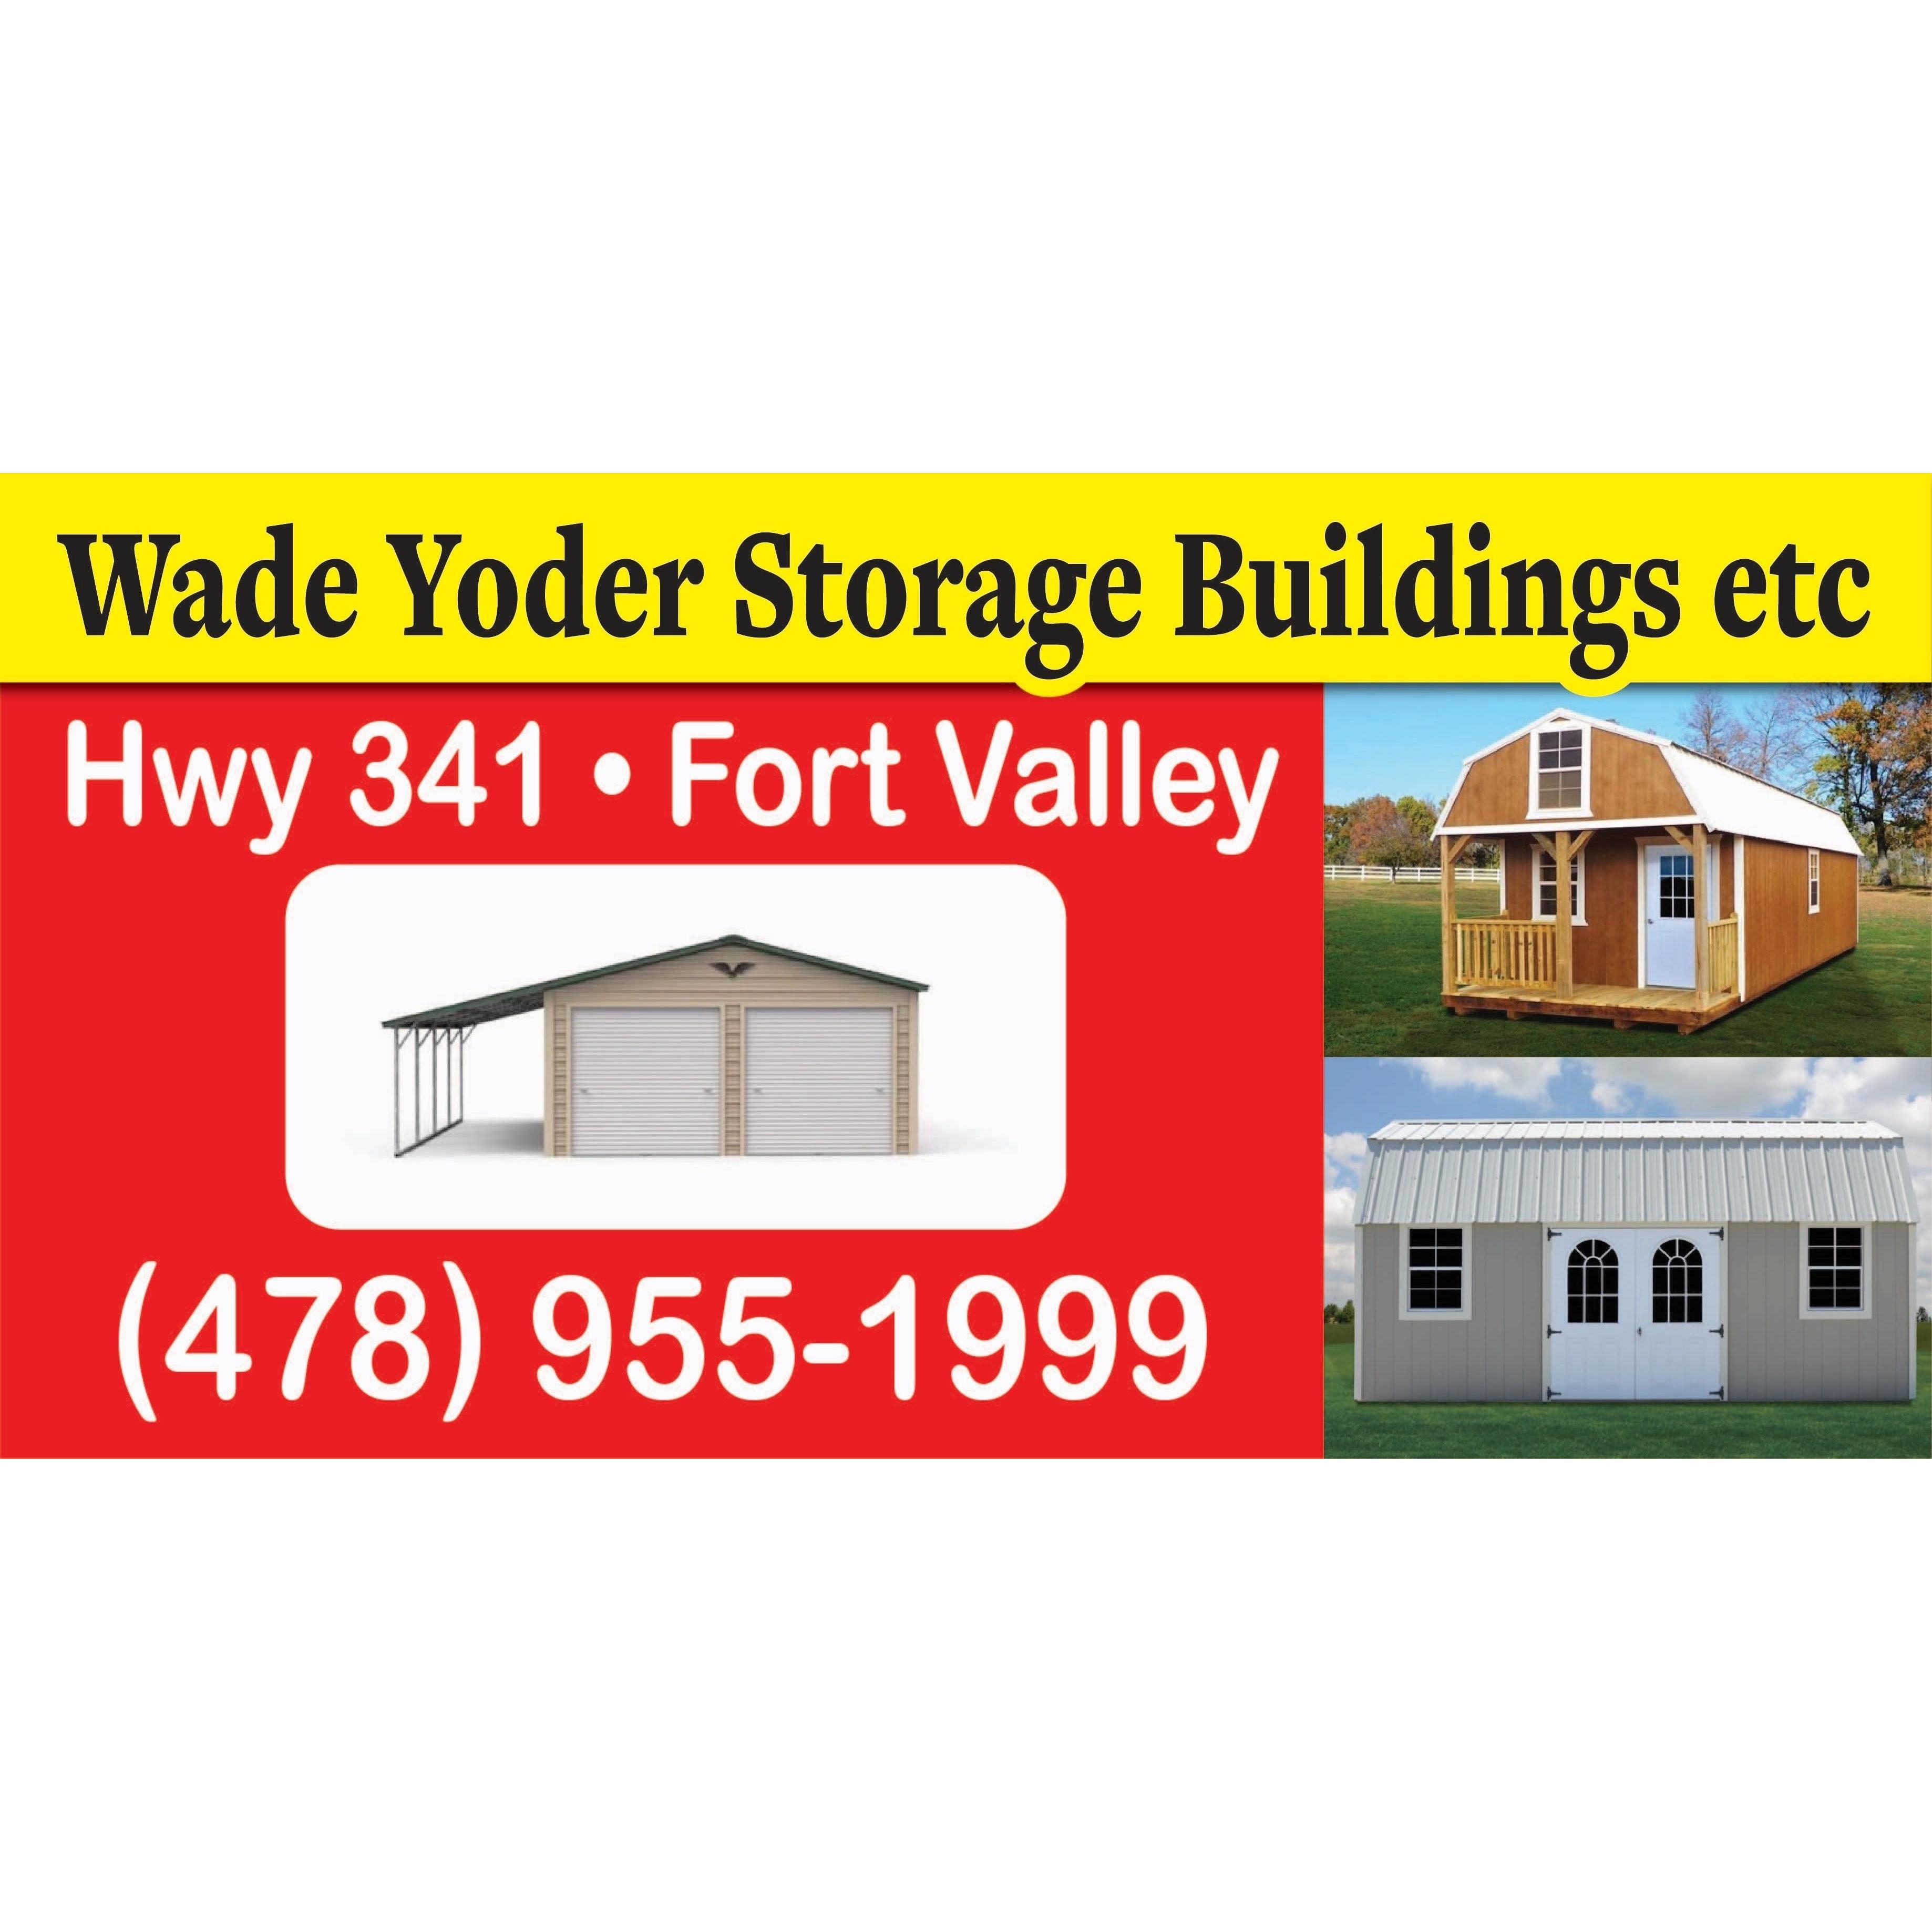 Wade Yoder Storage Buildings etc image 33